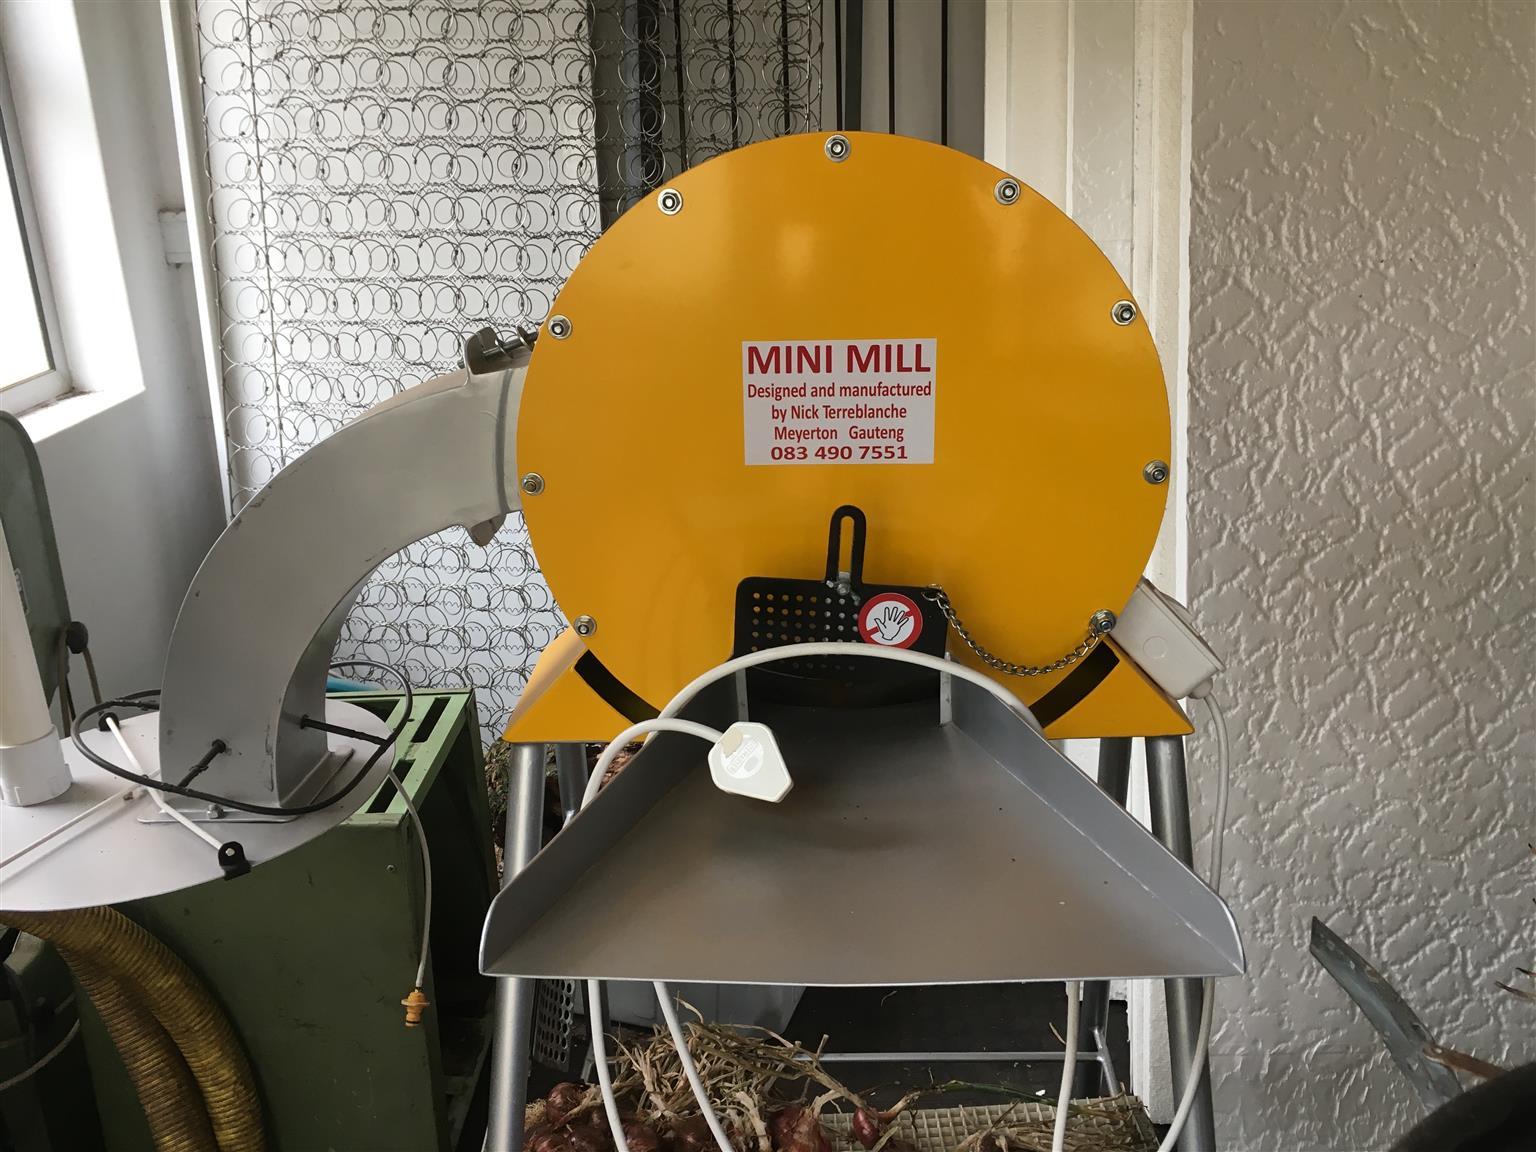 Hammermill (Minimill)